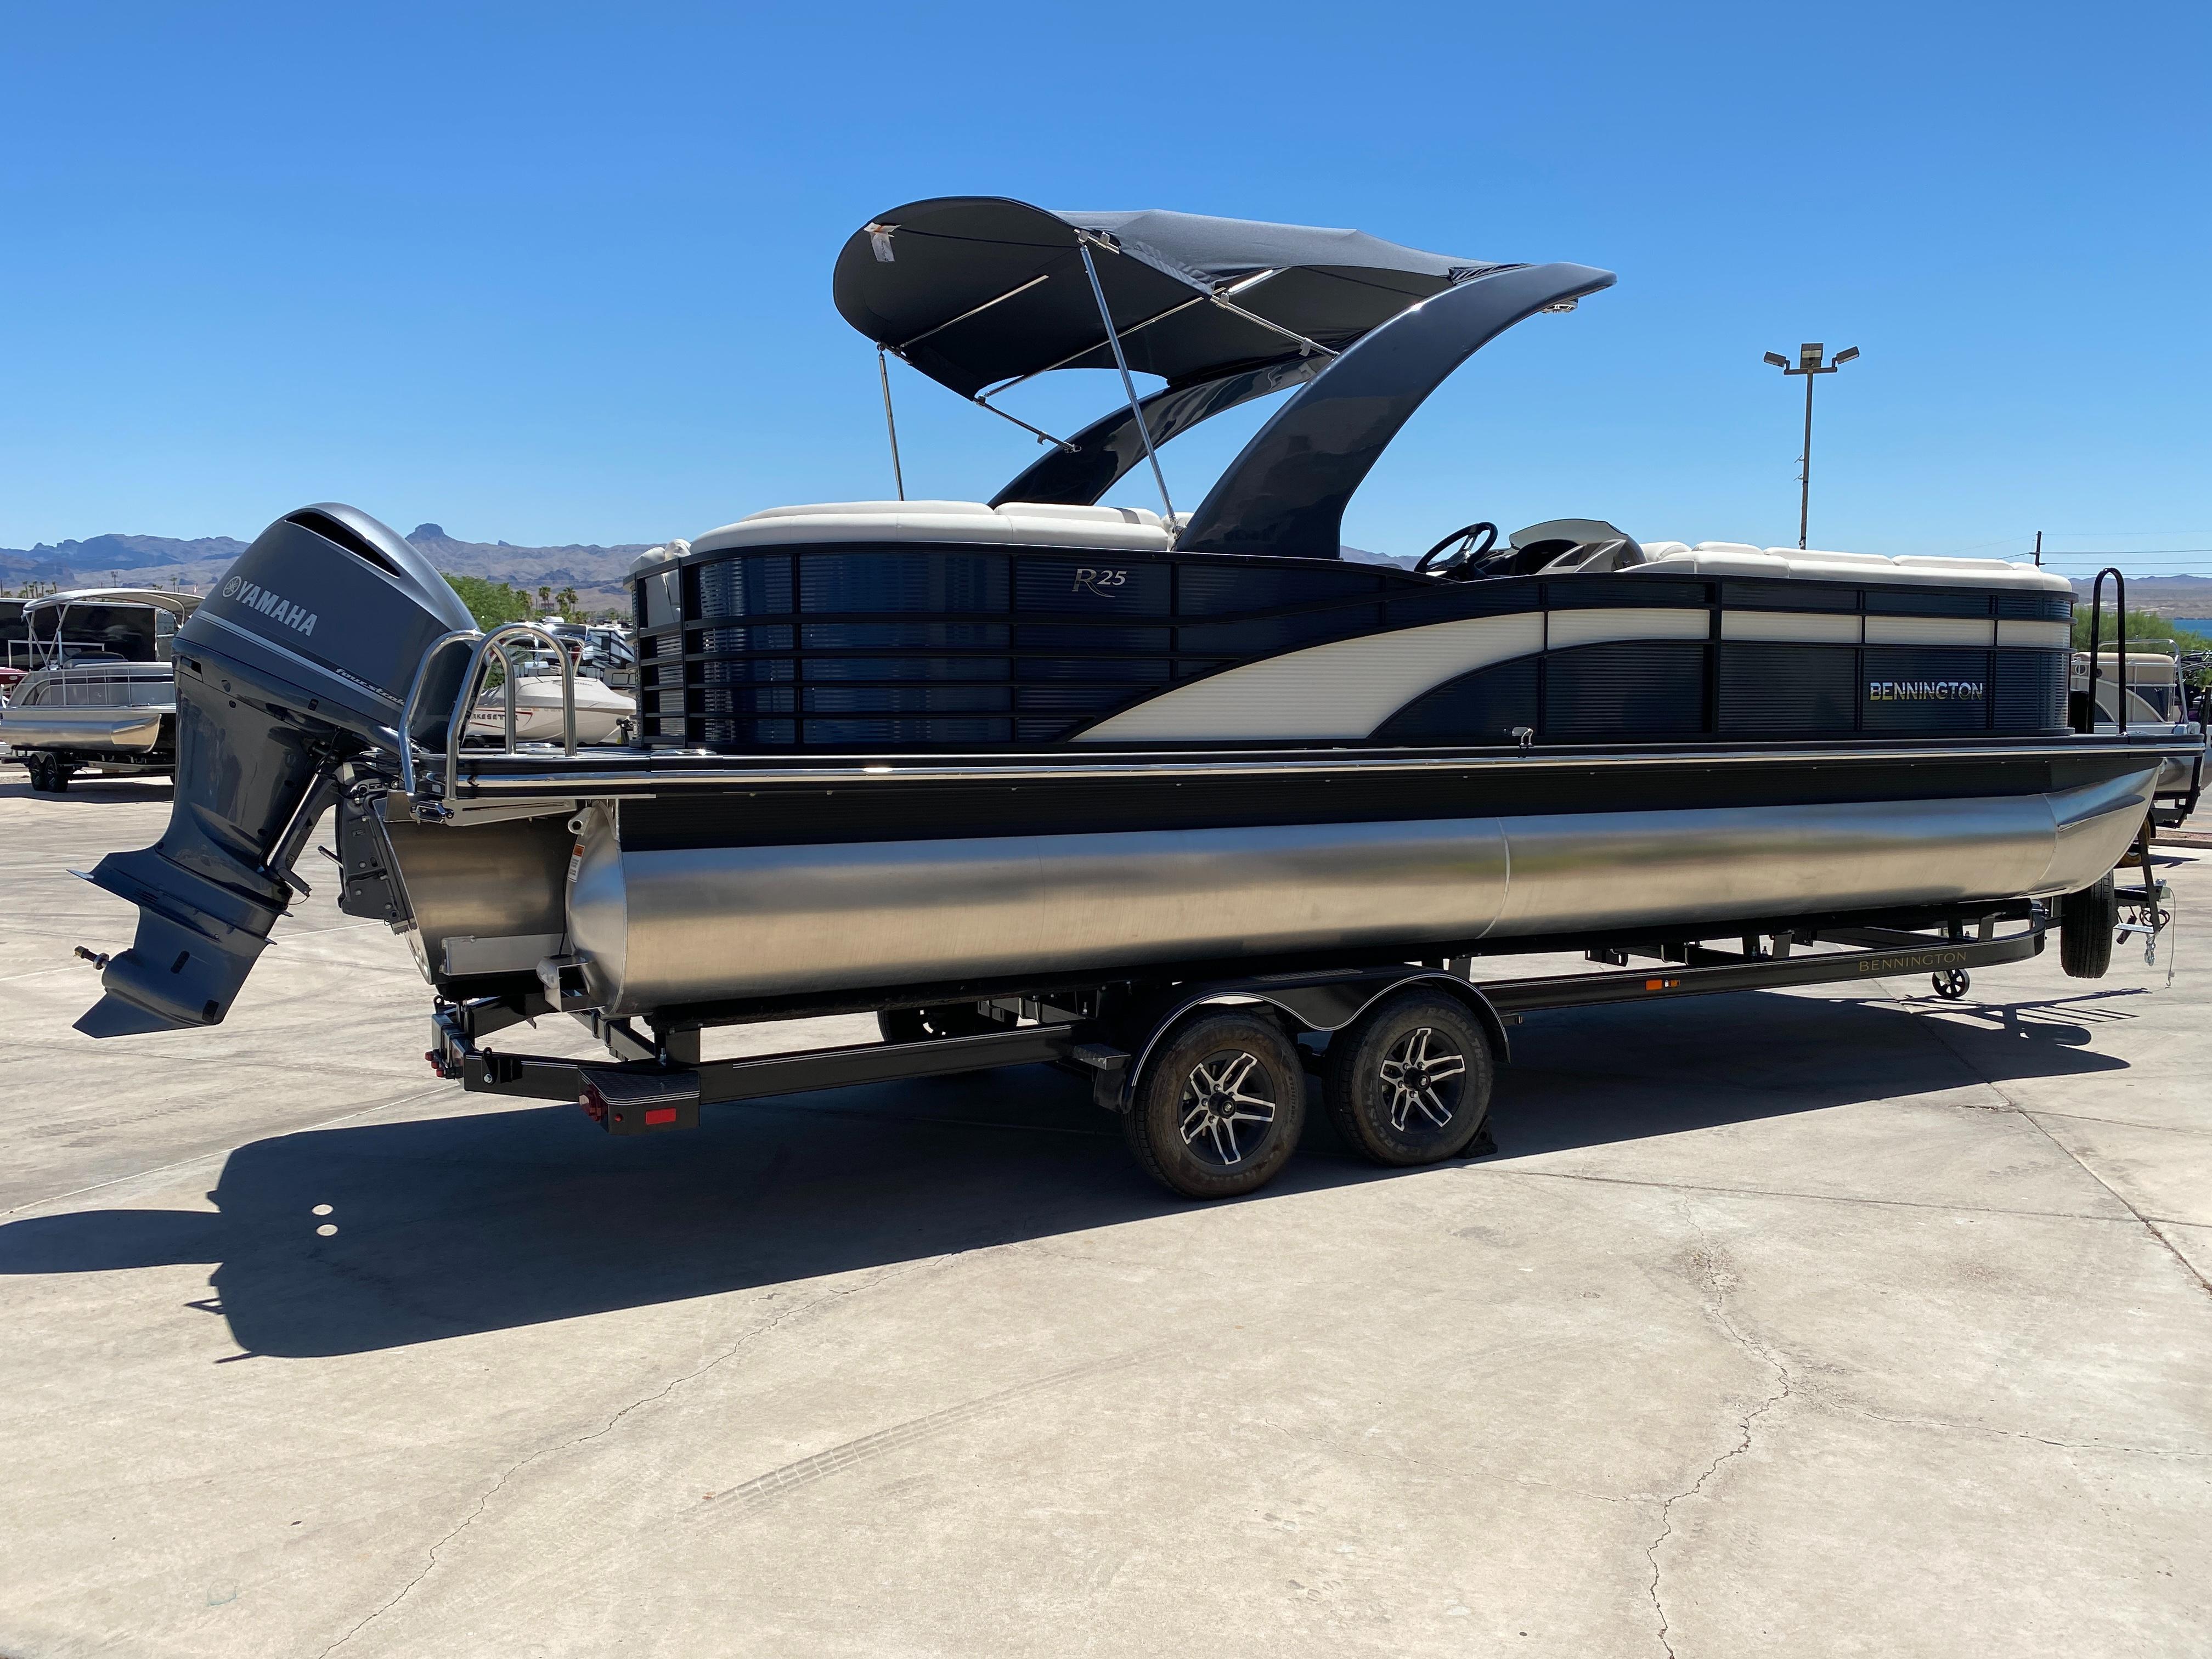 2020 Bennington R 25 RSRA #B7311I inventory image at Sun Country Inland in Lake Havasu City